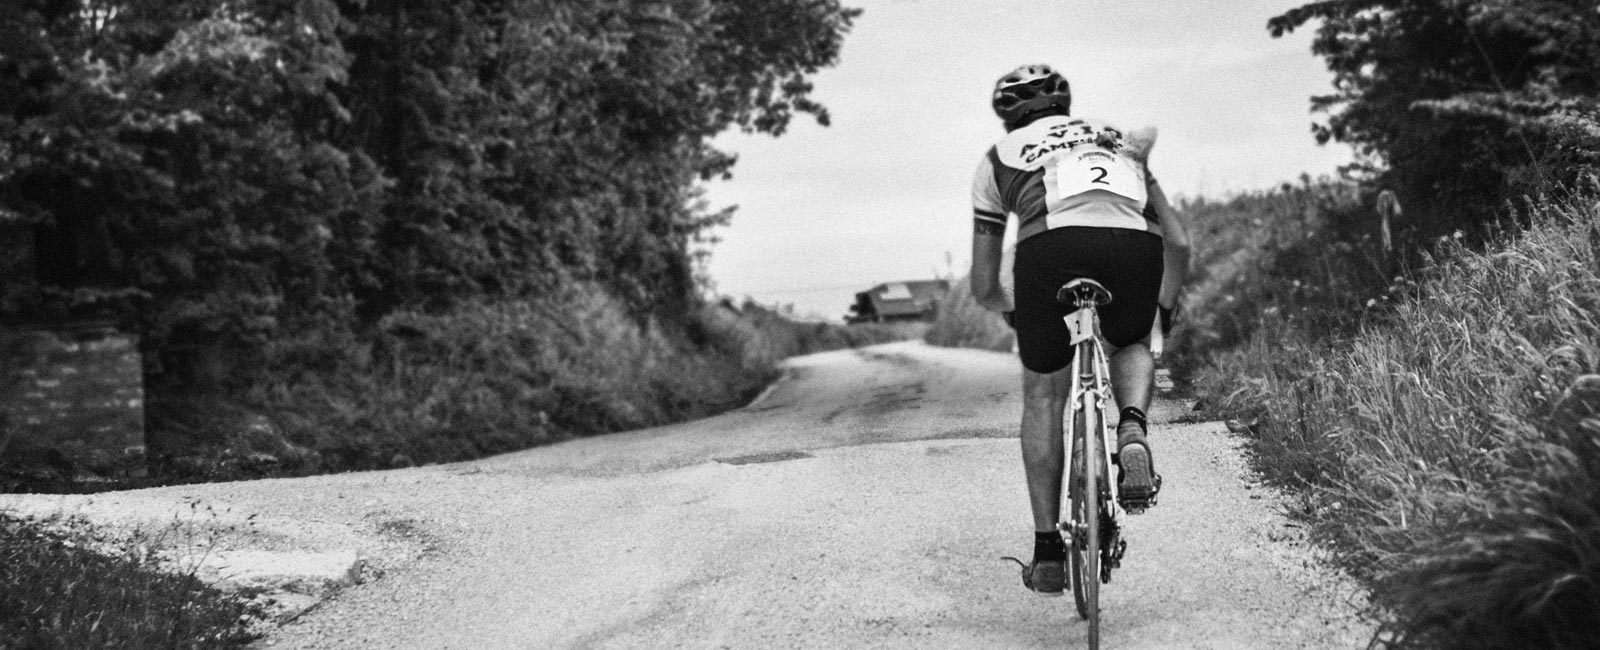 ciclocolli-storica-ciclostorica-marche